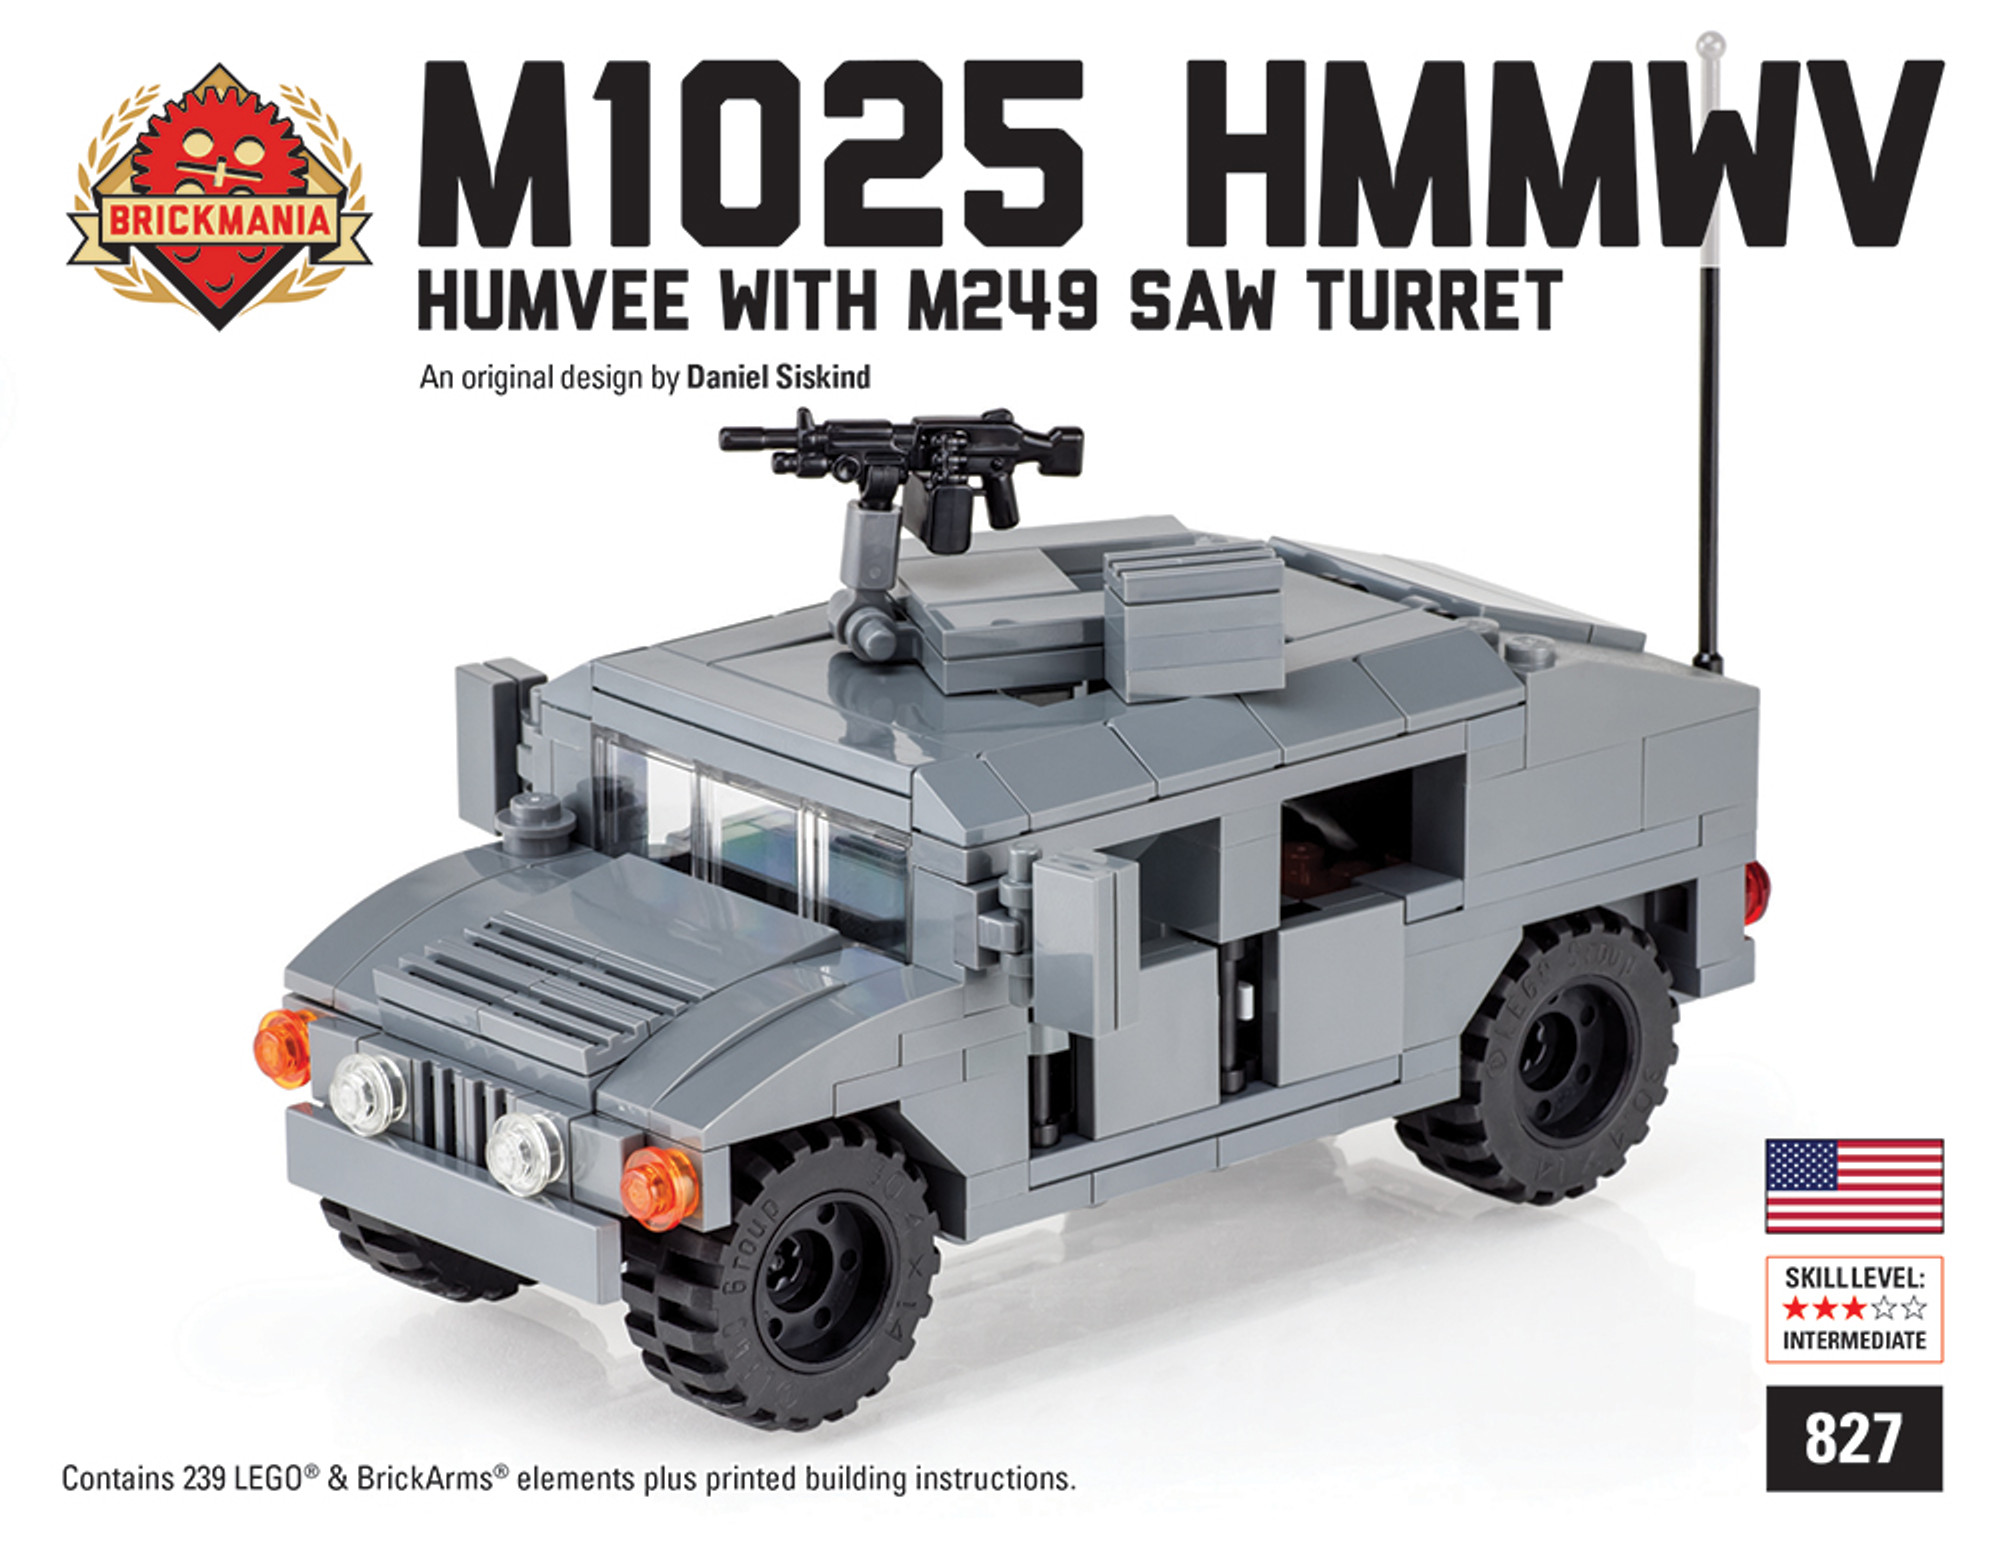 M1025 Hmmwv Humvee With M249 Saw Brickmania Toys